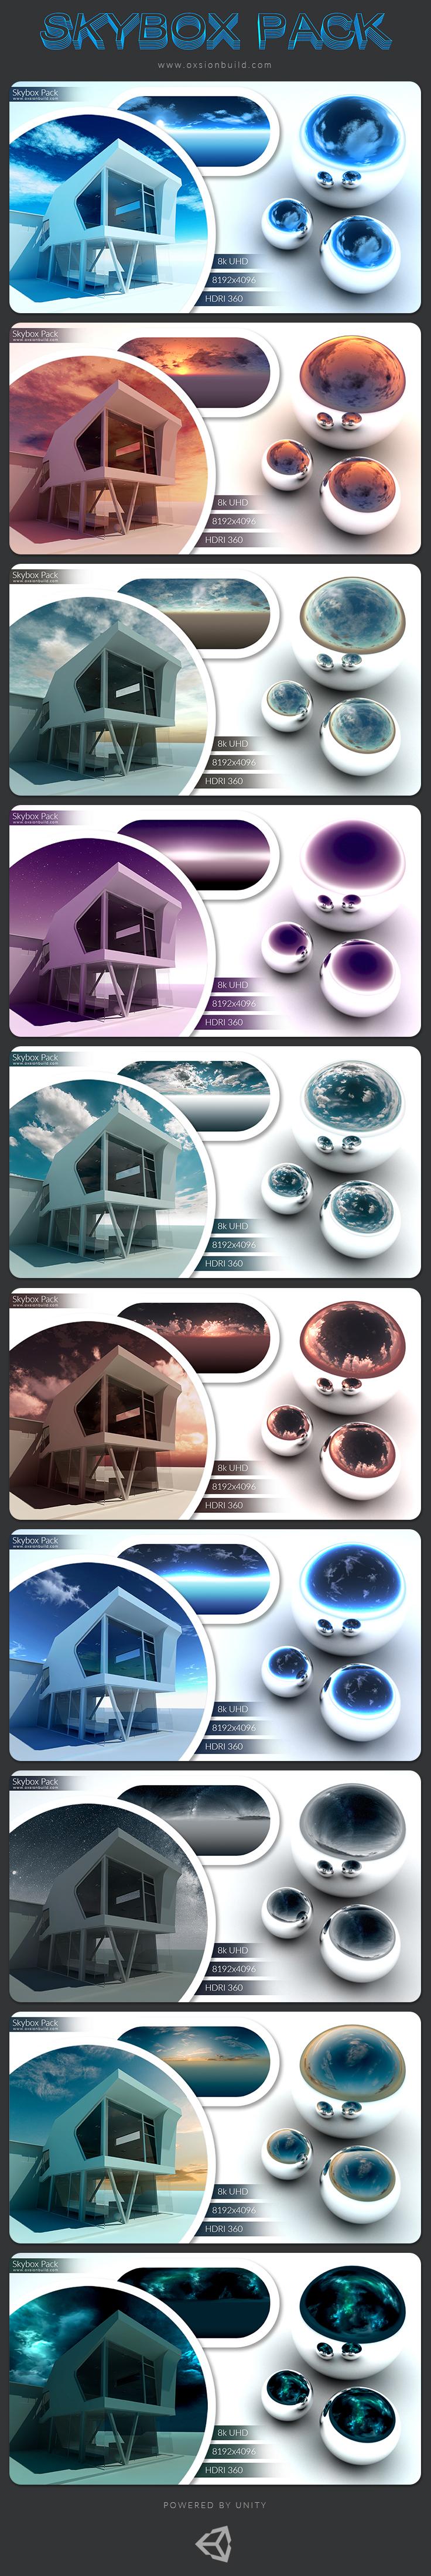 skybox sky box cubemap panorama HDRI 360* environment azure